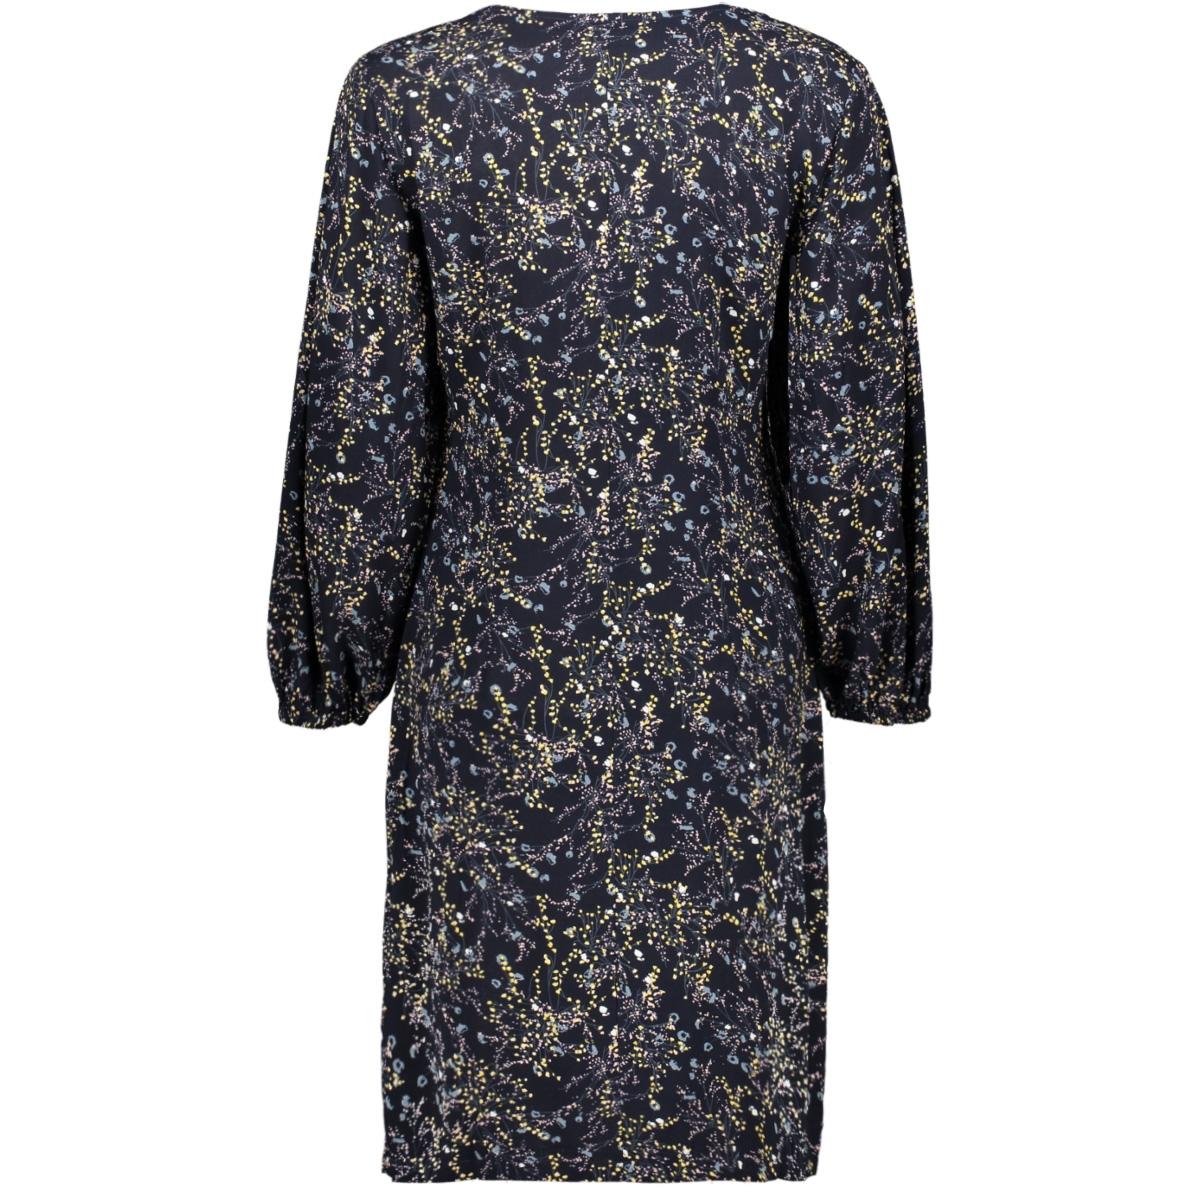 woven dress s s 30501613 u6010 saint tropez jurk 9069